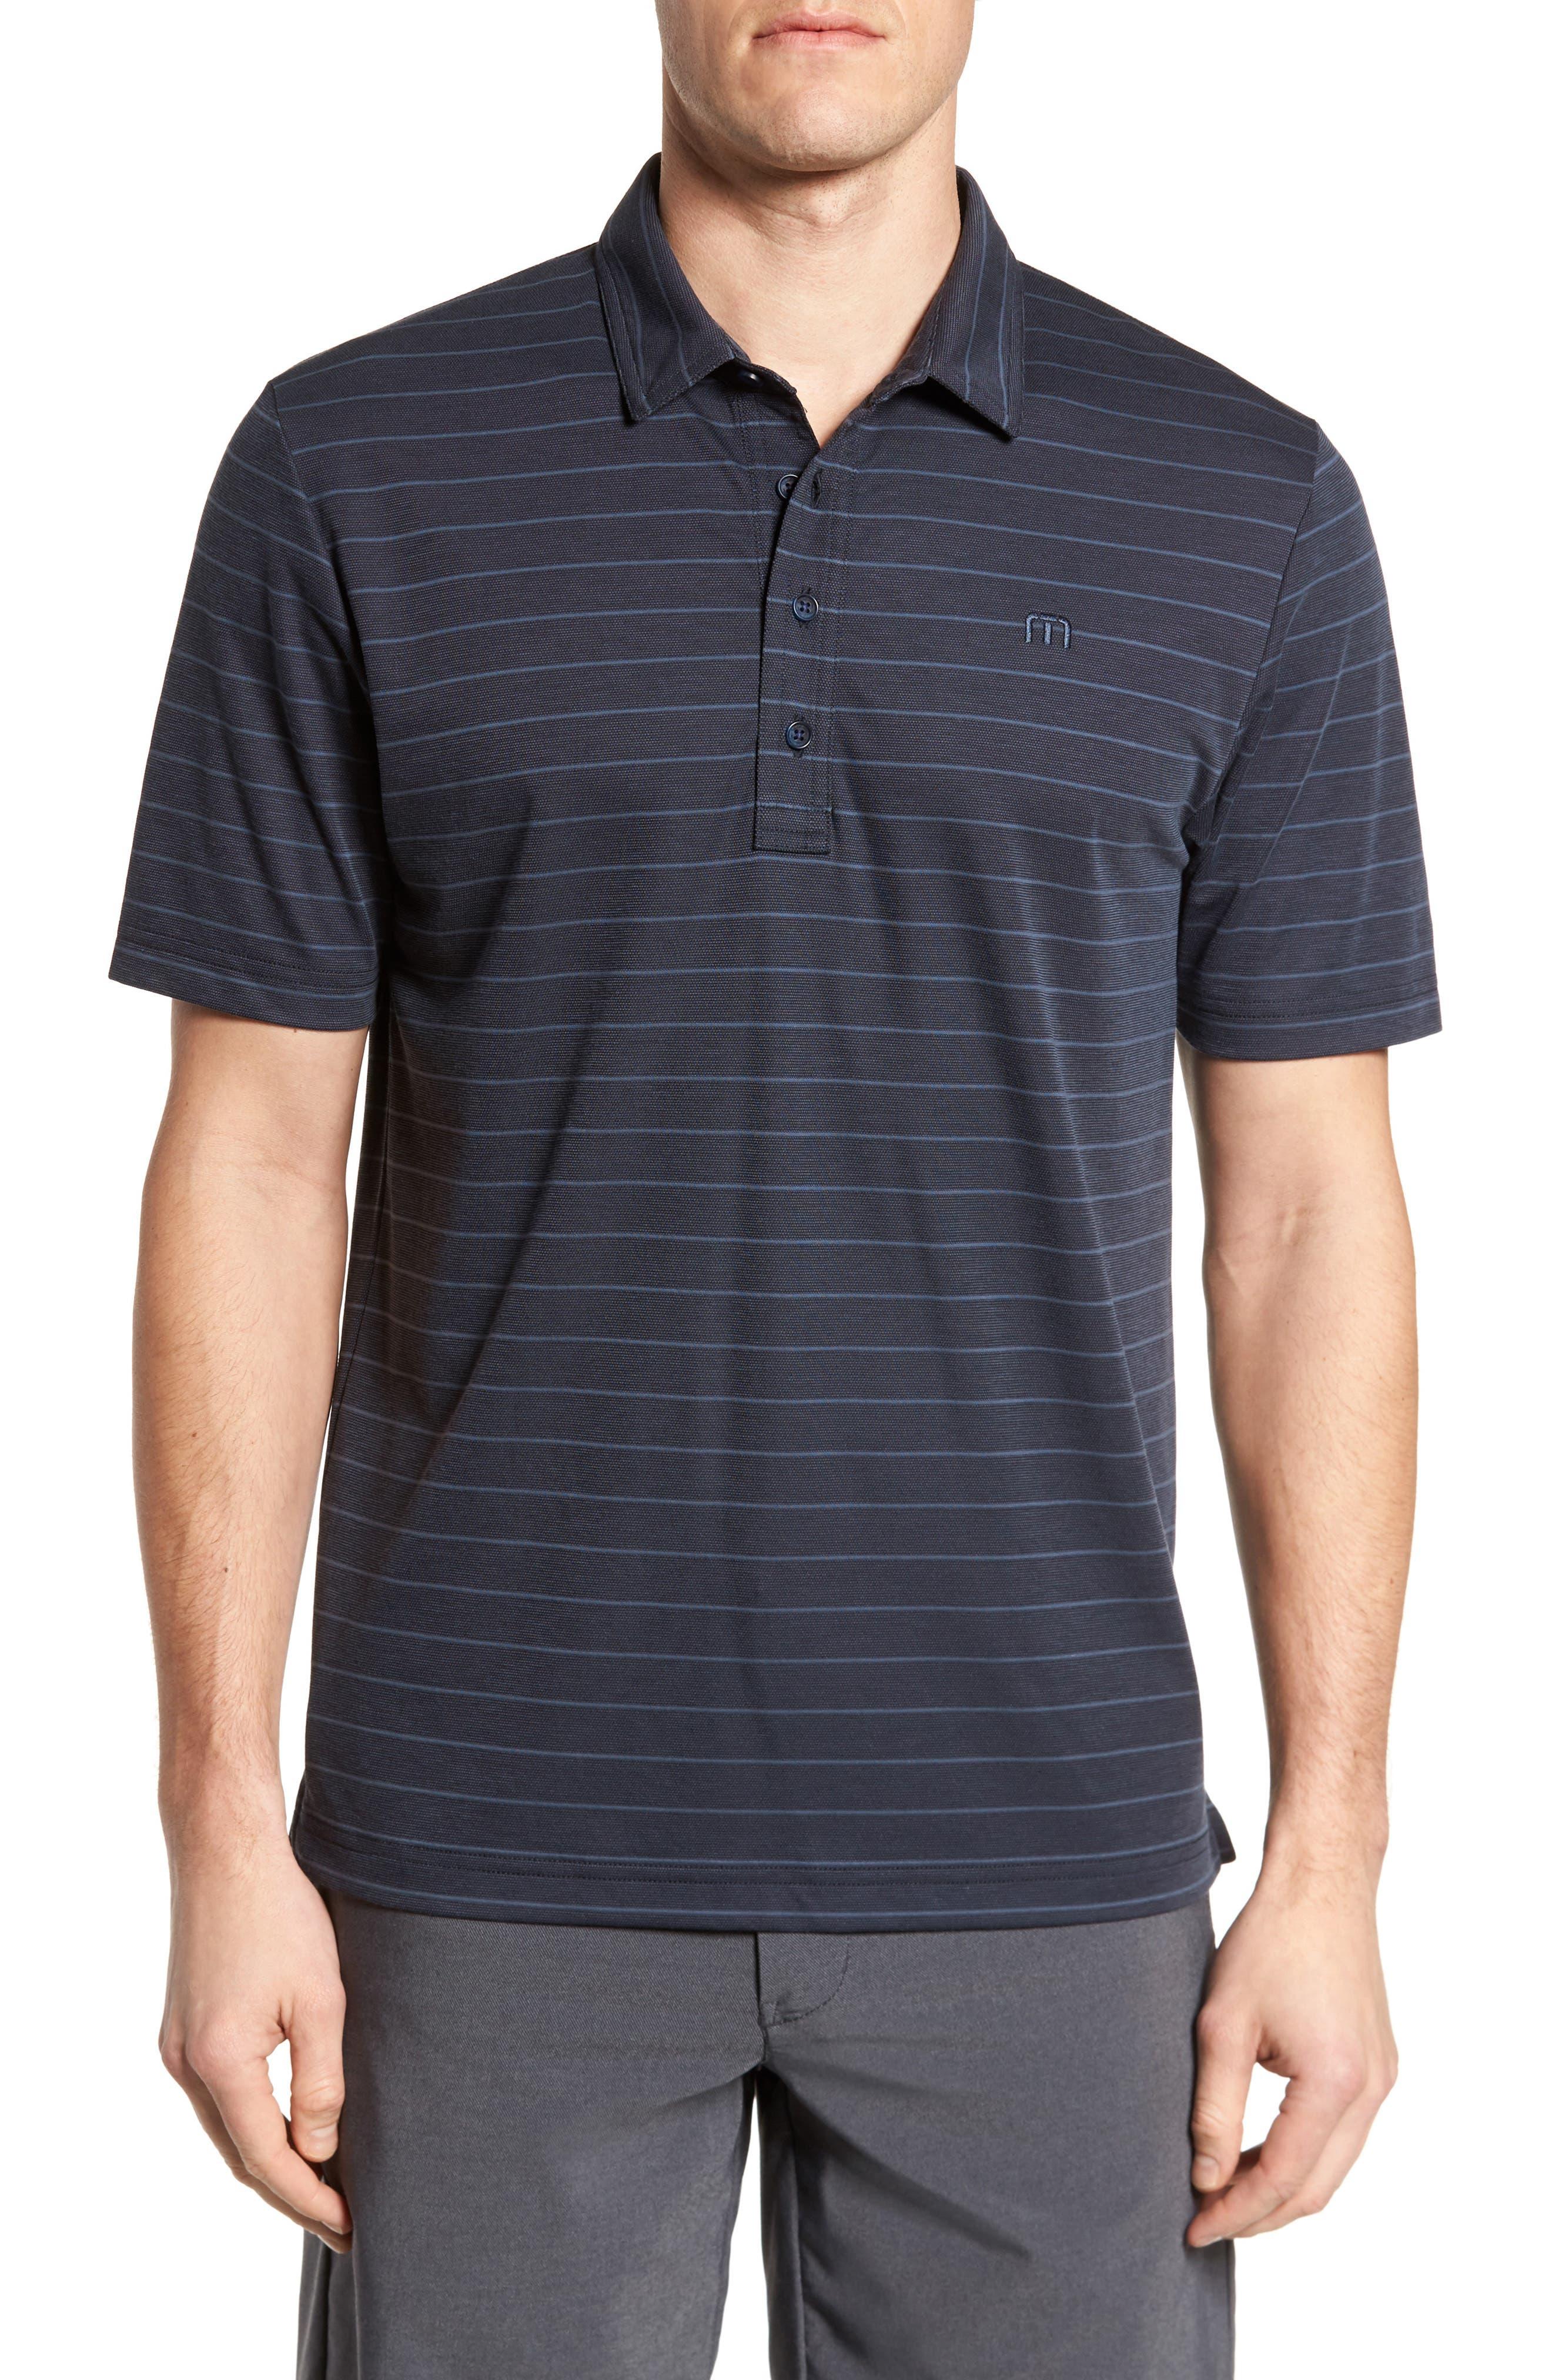 Marini Polo Shirt,                         Main,                         color, Blue Nights/ Allure